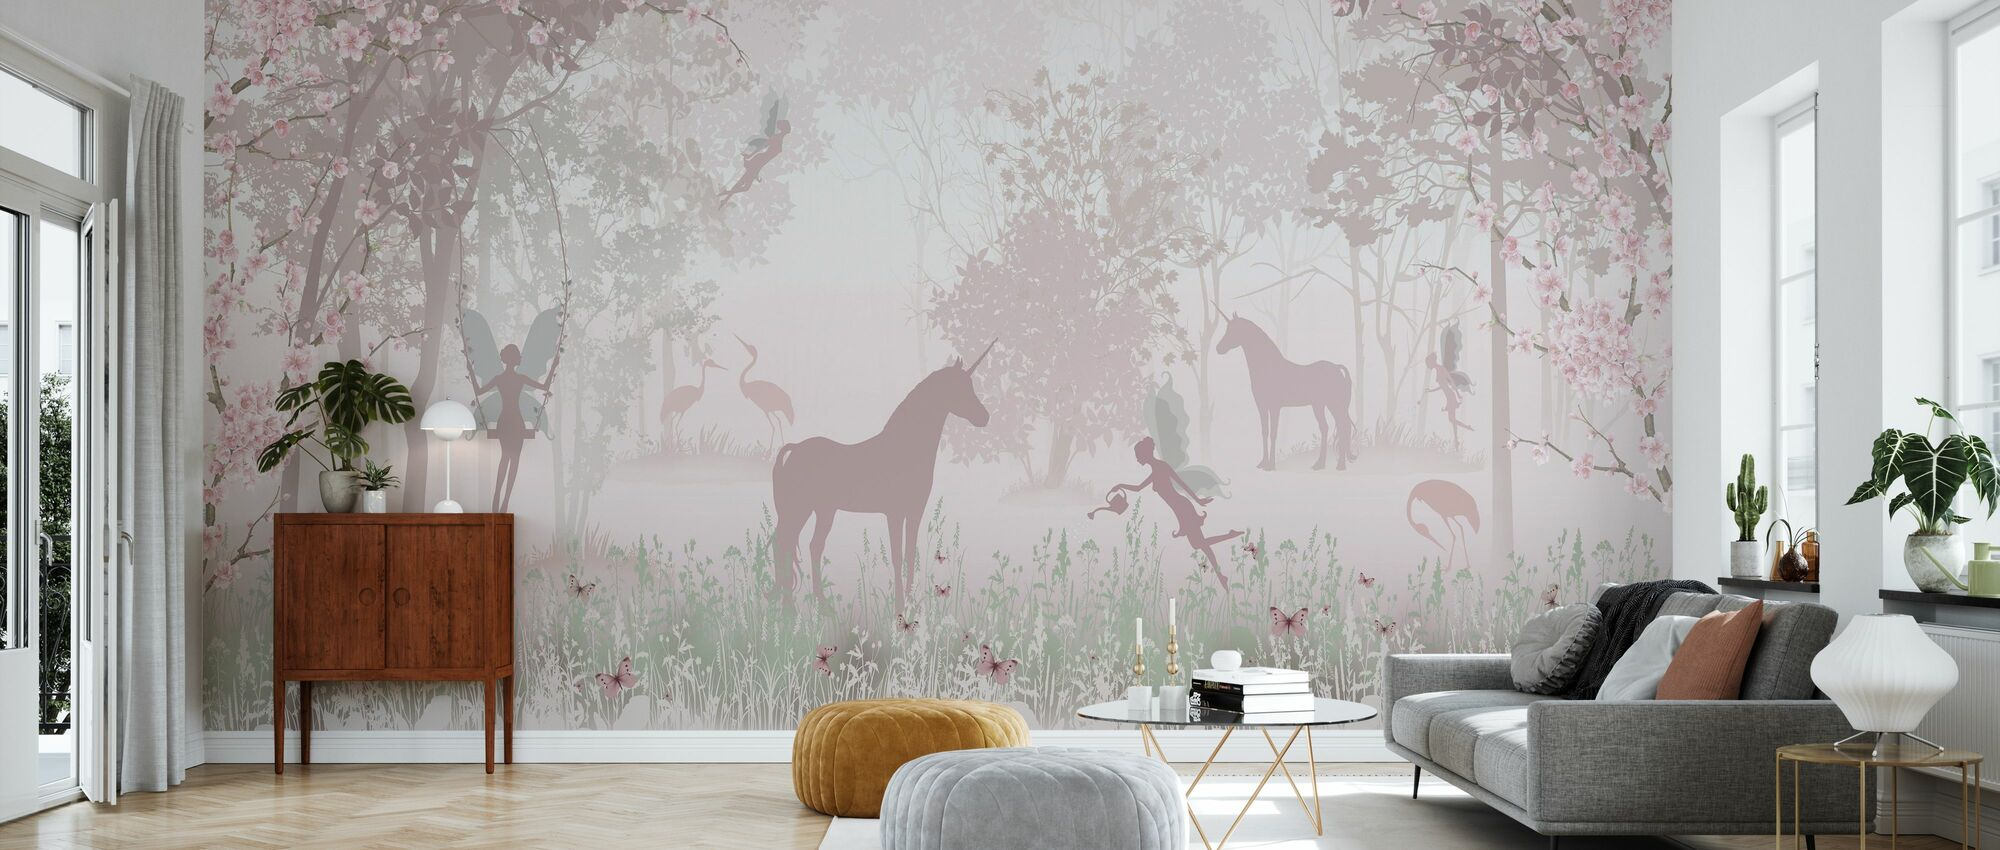 Unicorns and Fairies - Wallpaper - Living Room